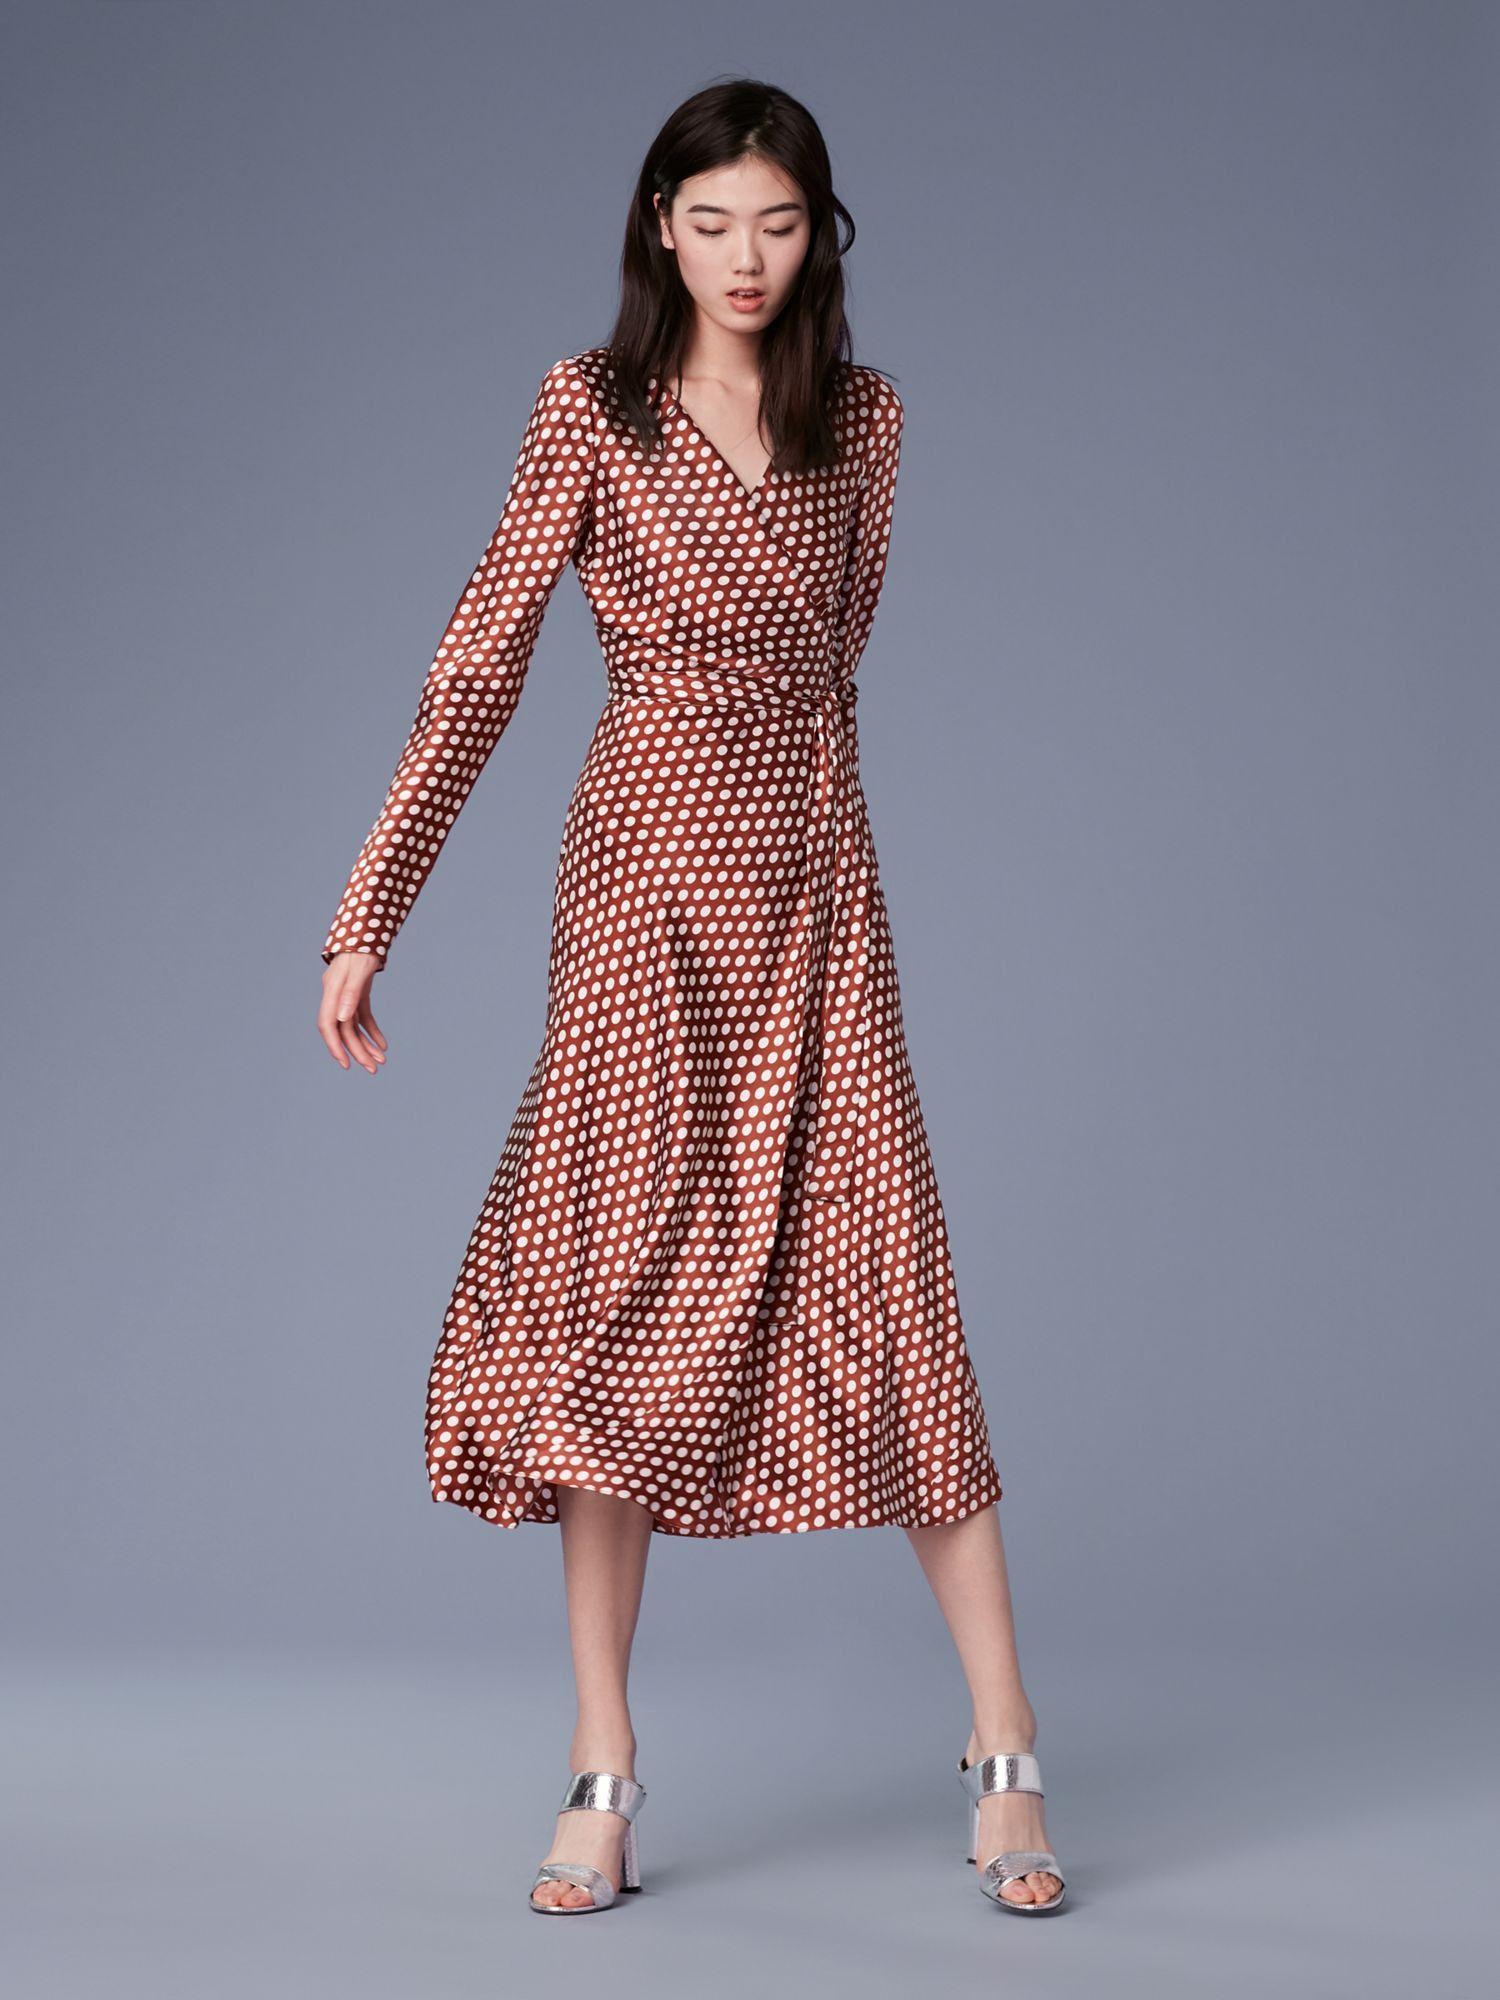 7cc364f0f008e8 Diane Von Furstenberg Dvf Tilly Satin Dress - Baker Dot Sml Sienna 10